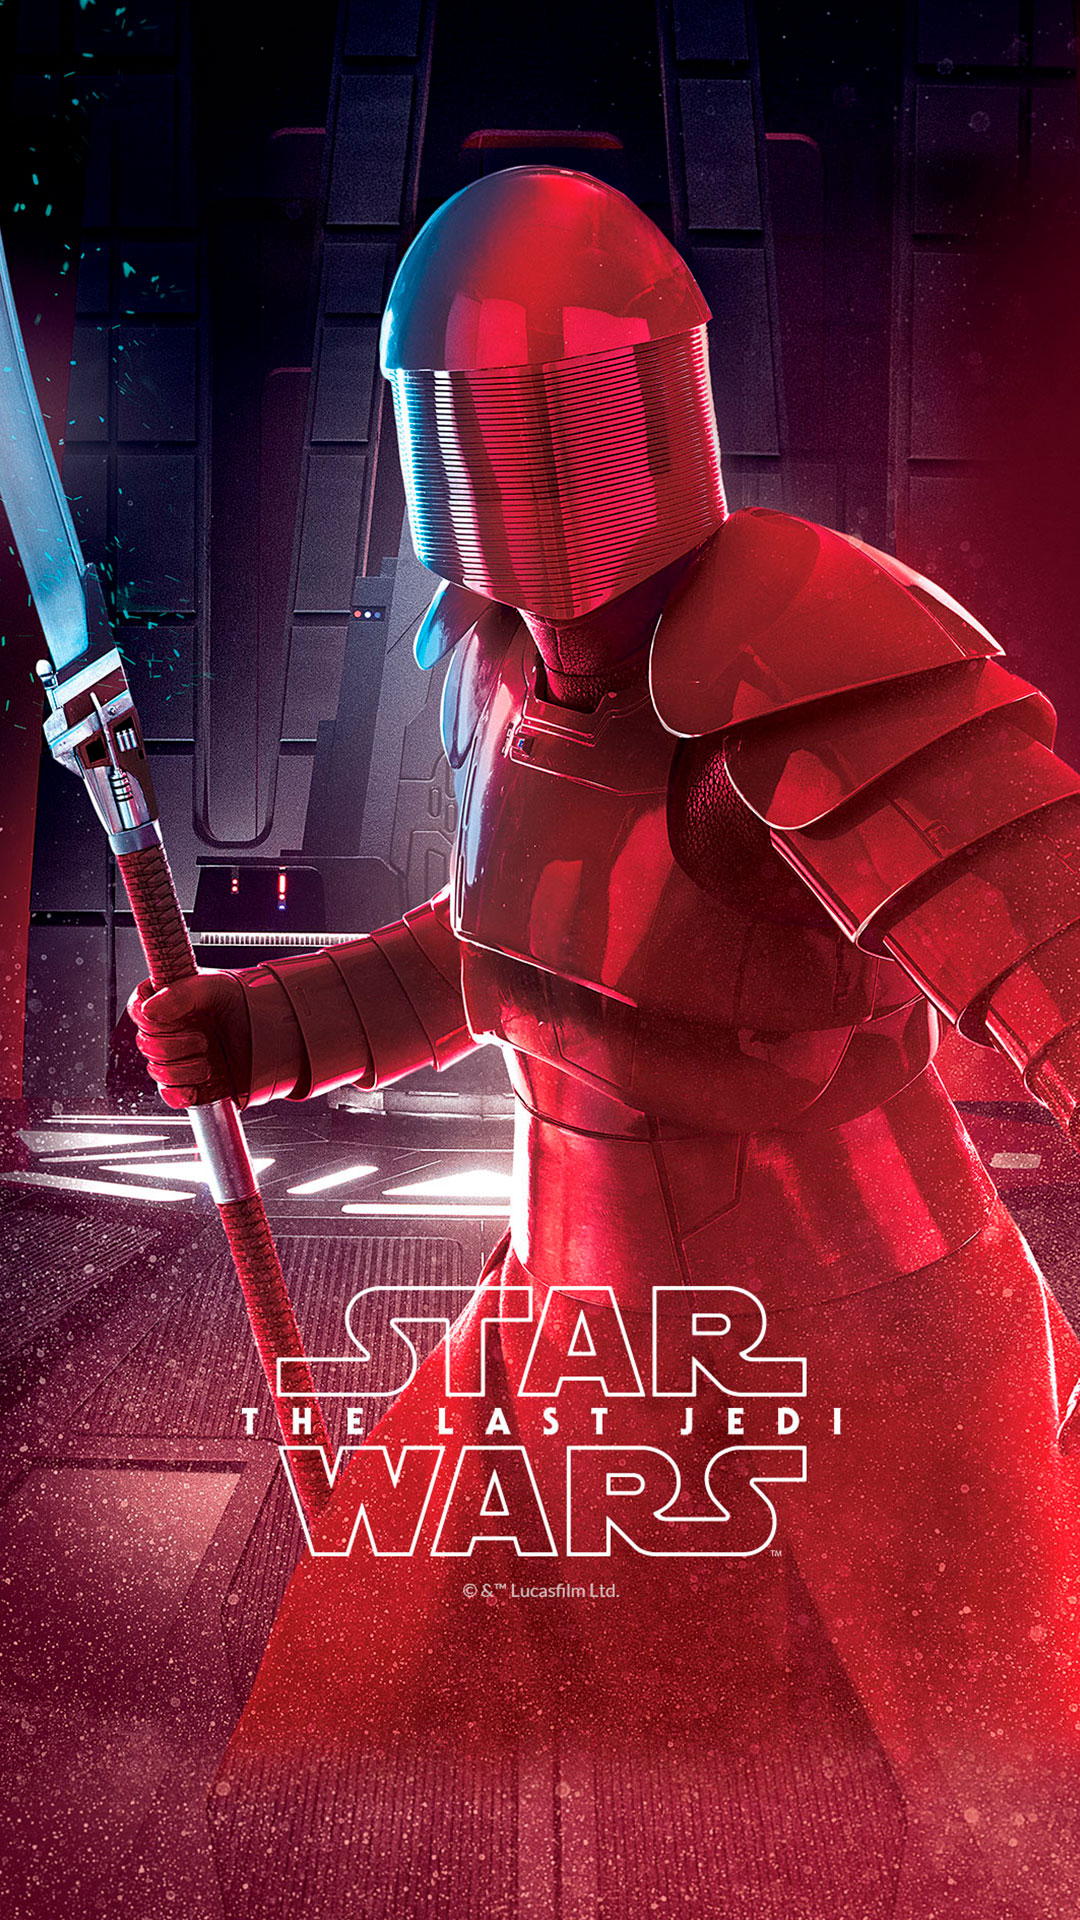 iPhone wallpaper star wars2 Star Wars